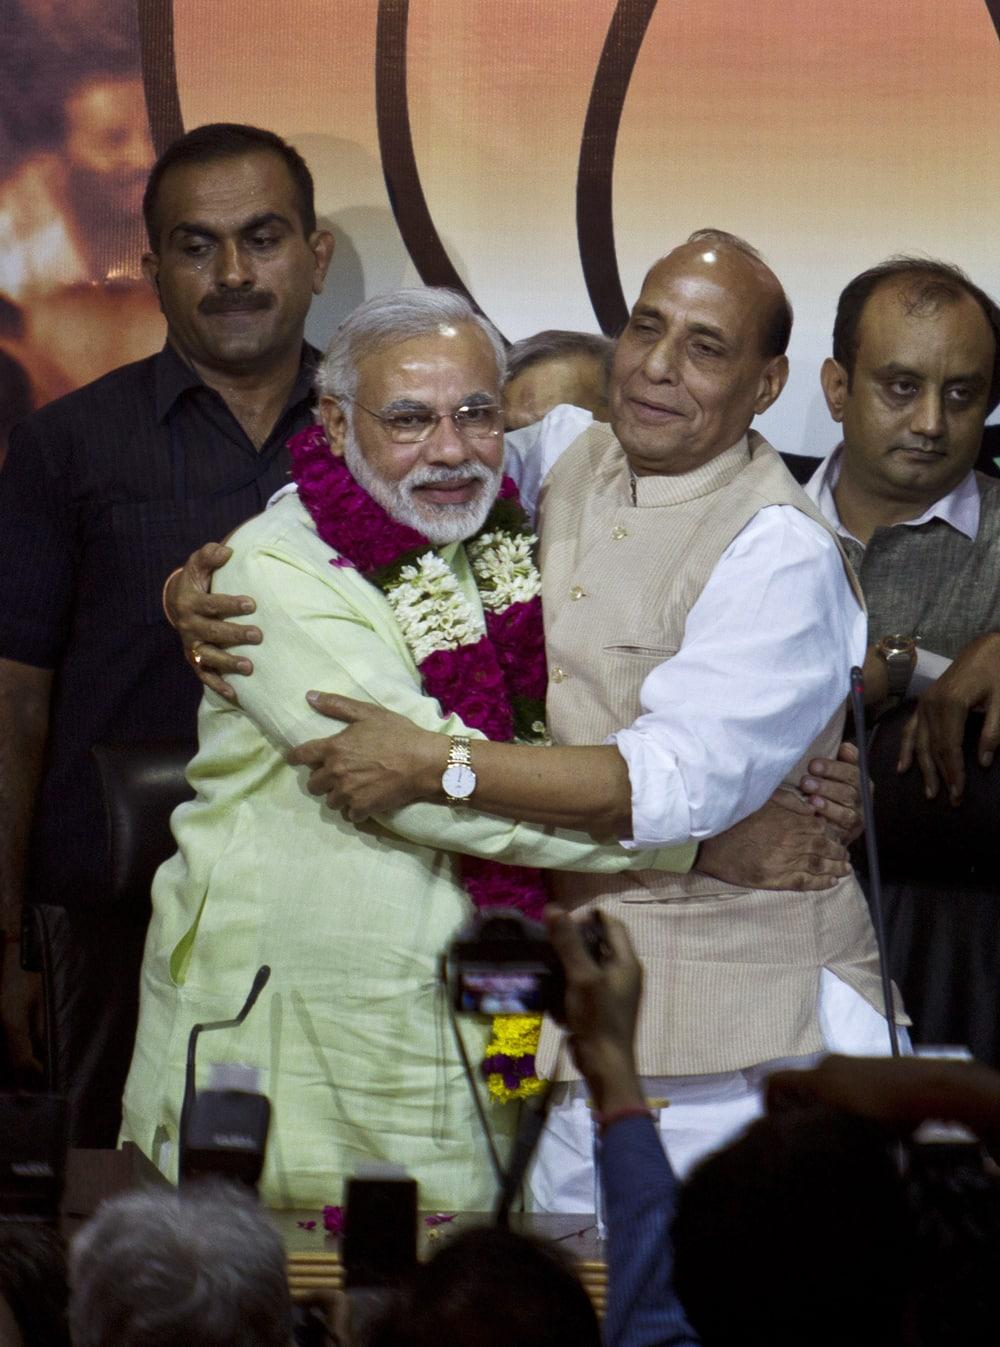 Bharatiya Janata Party (BJP) president Rajnath Singh hugs Gujarat state Chief Minister Narendra Modi after garlanding him in New Delhi.